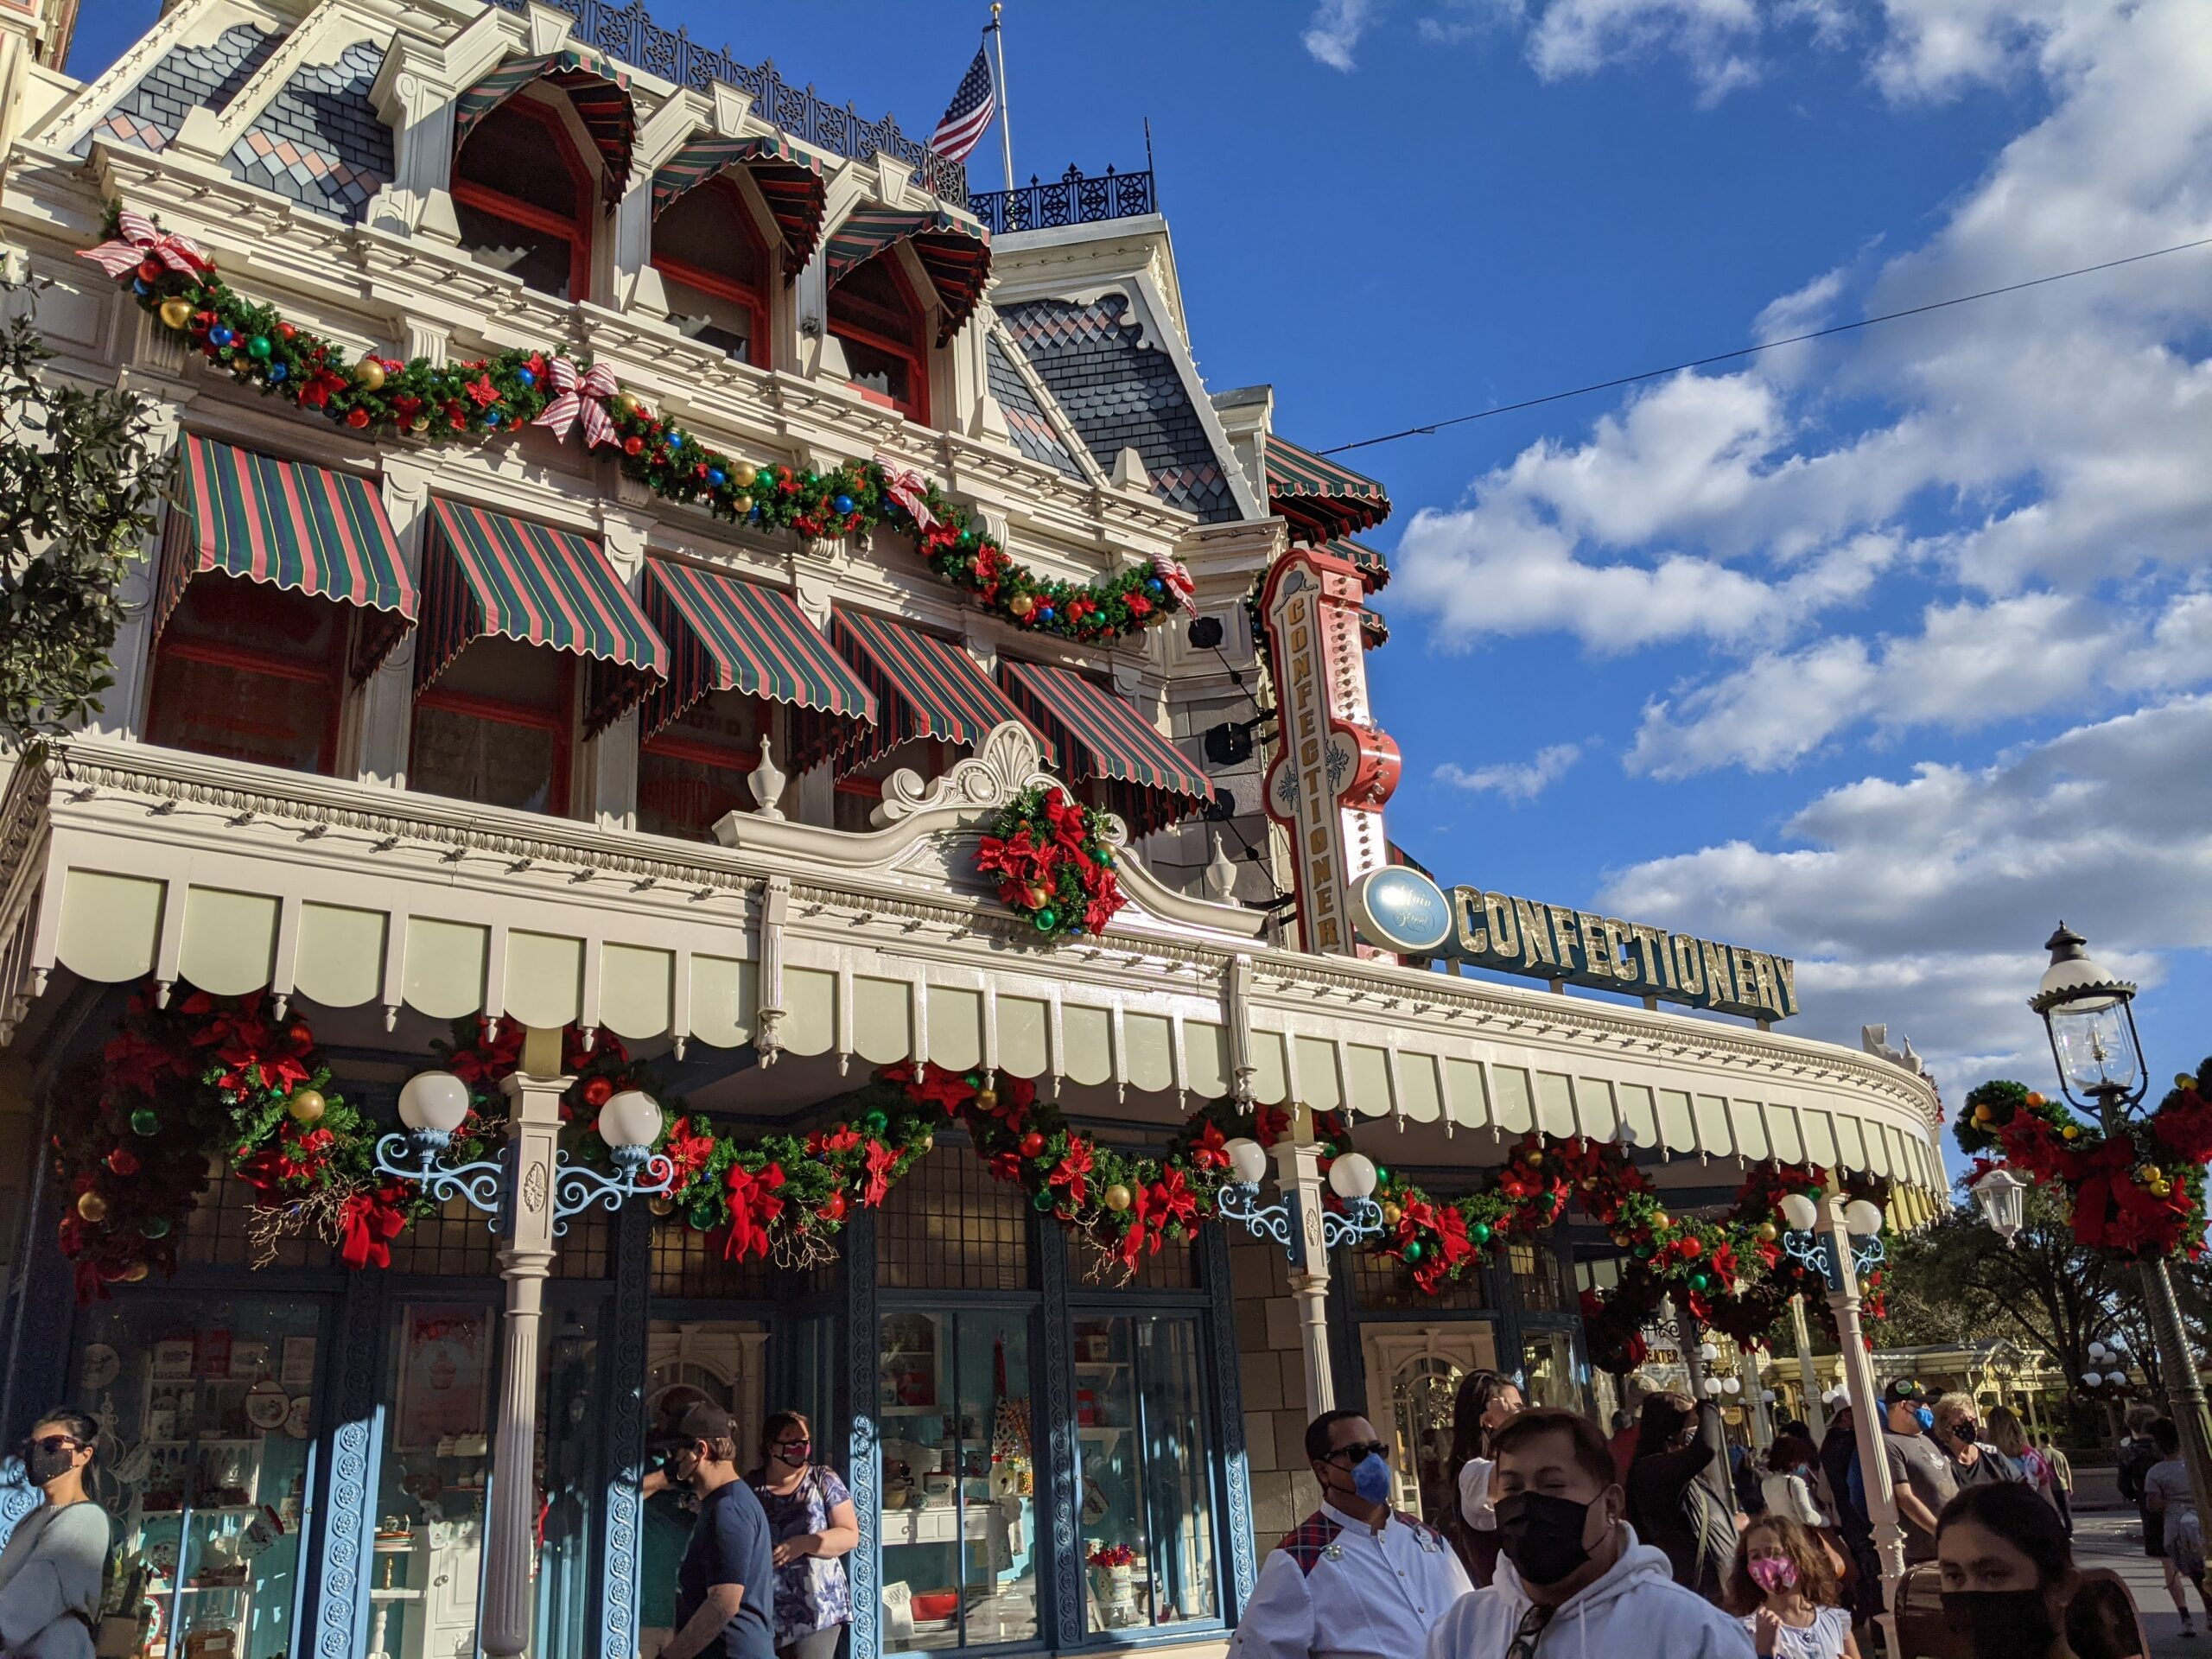 Main Street Confectionary - Magic Kingdom